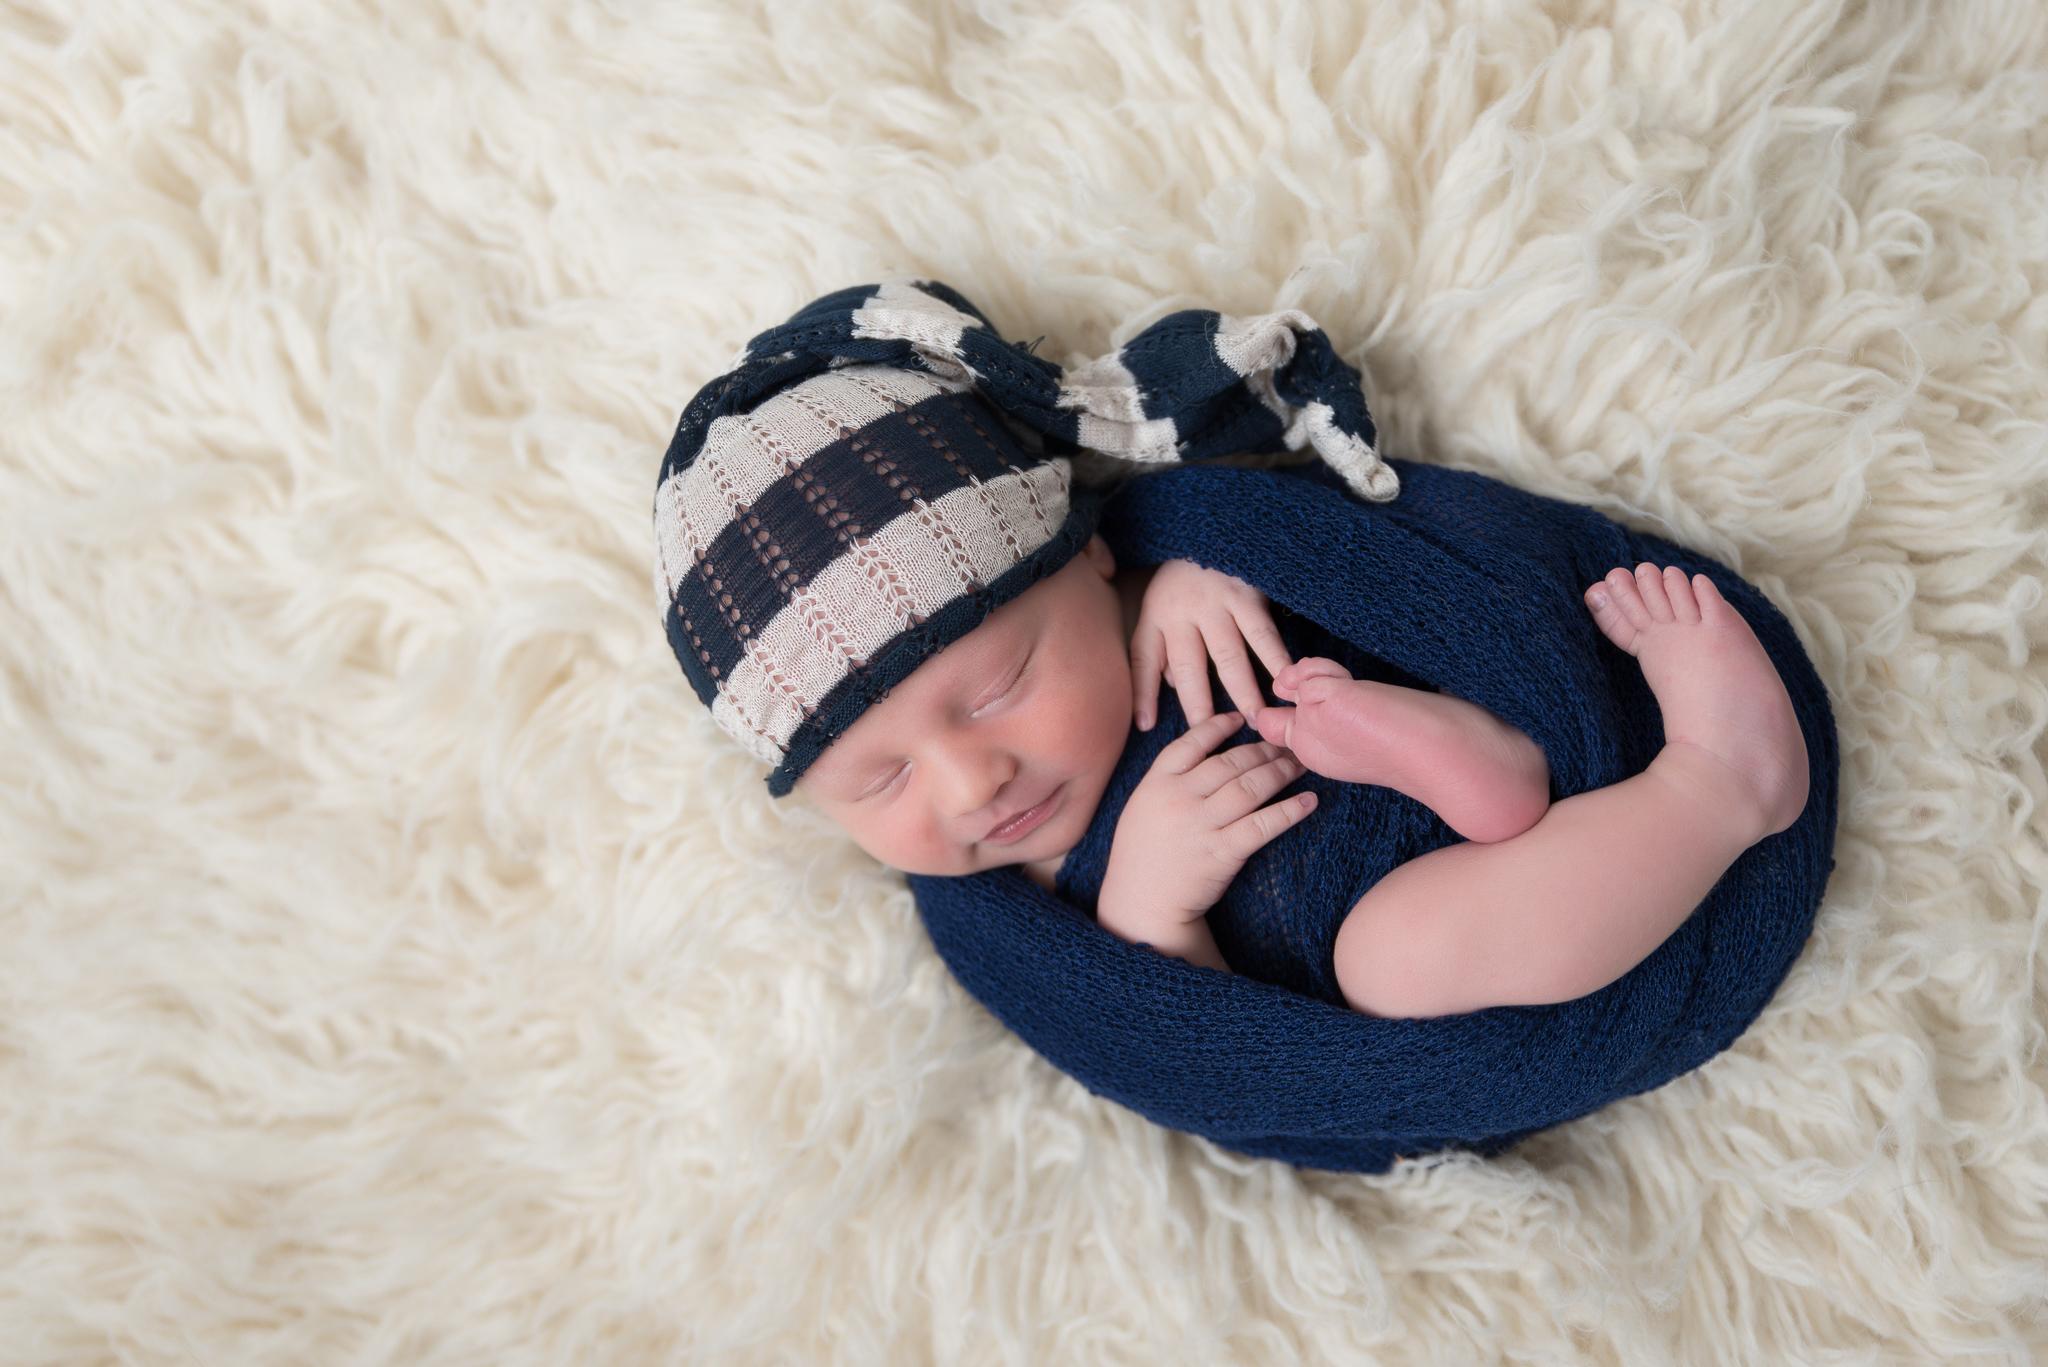 Chevy-chase-md-newborn-photographer69.jpg